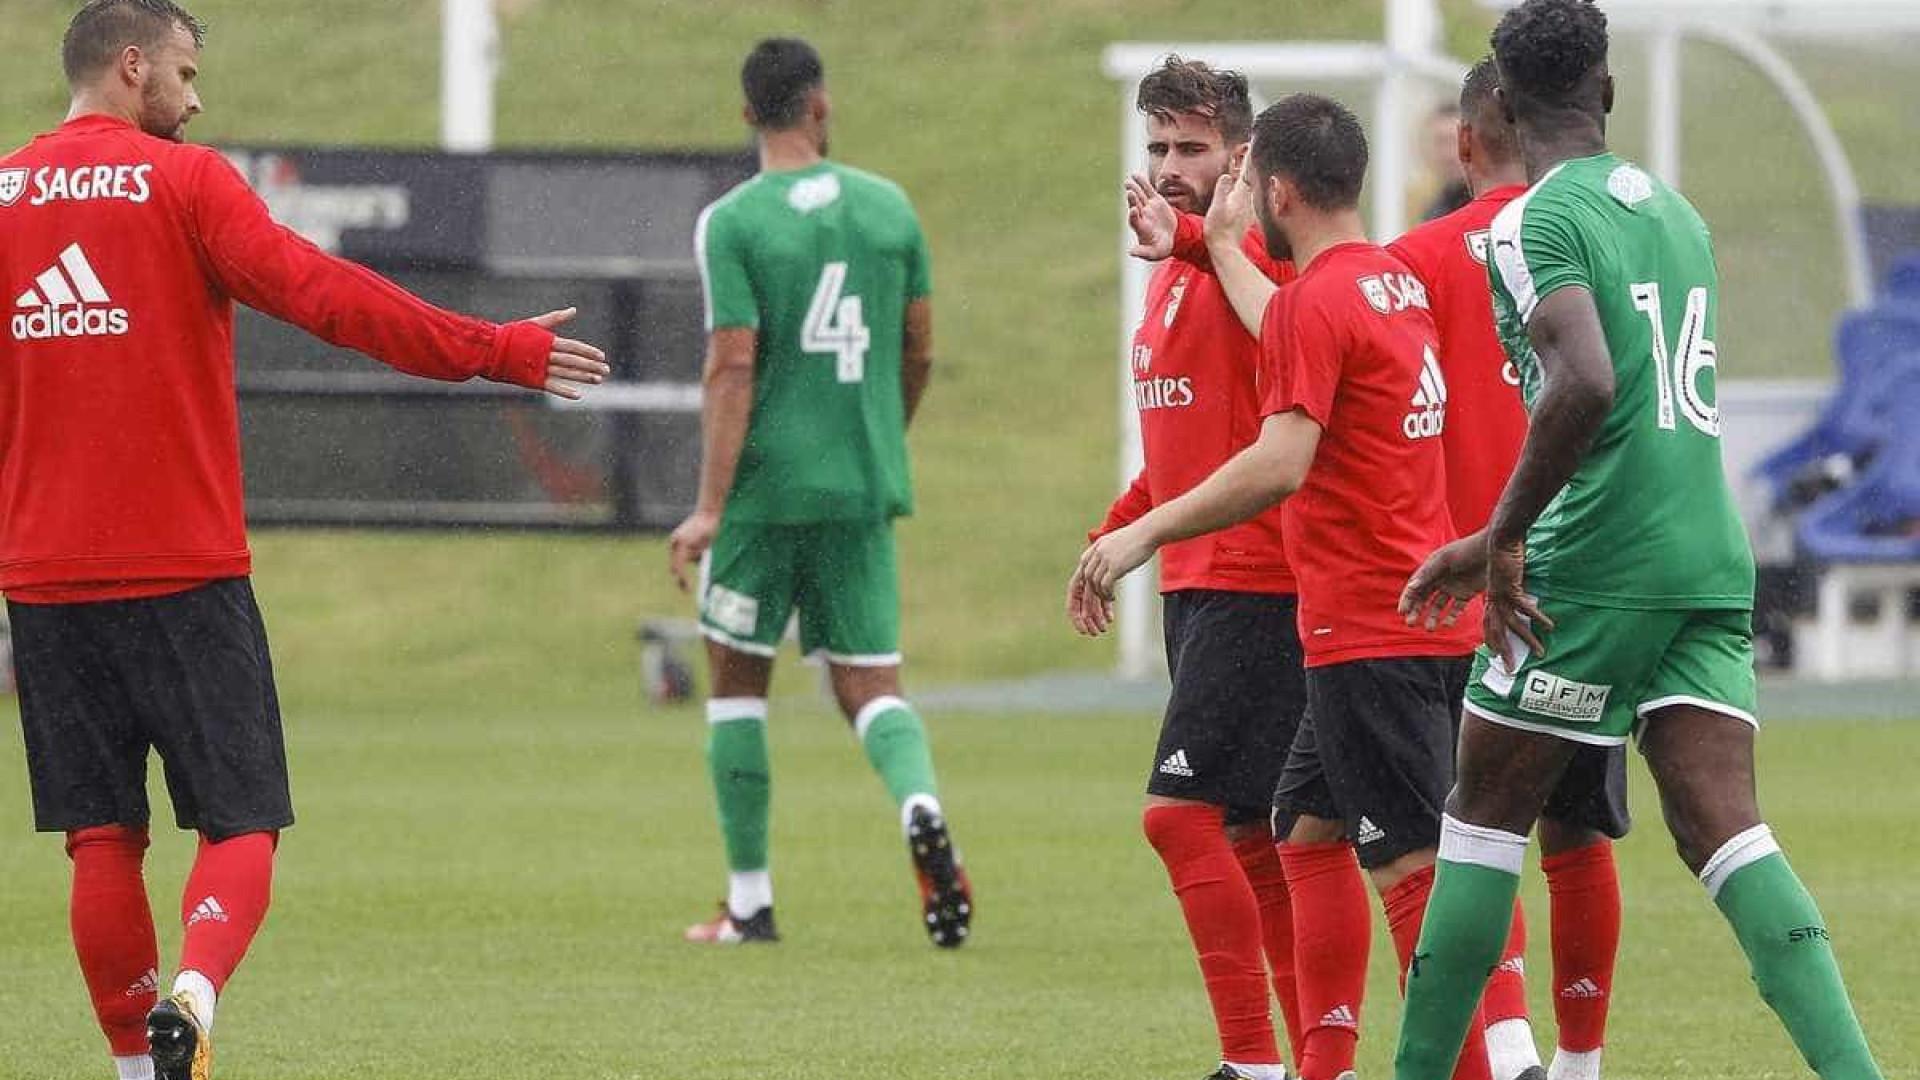 Benfica derrota equipa inglesa em jogo-treino